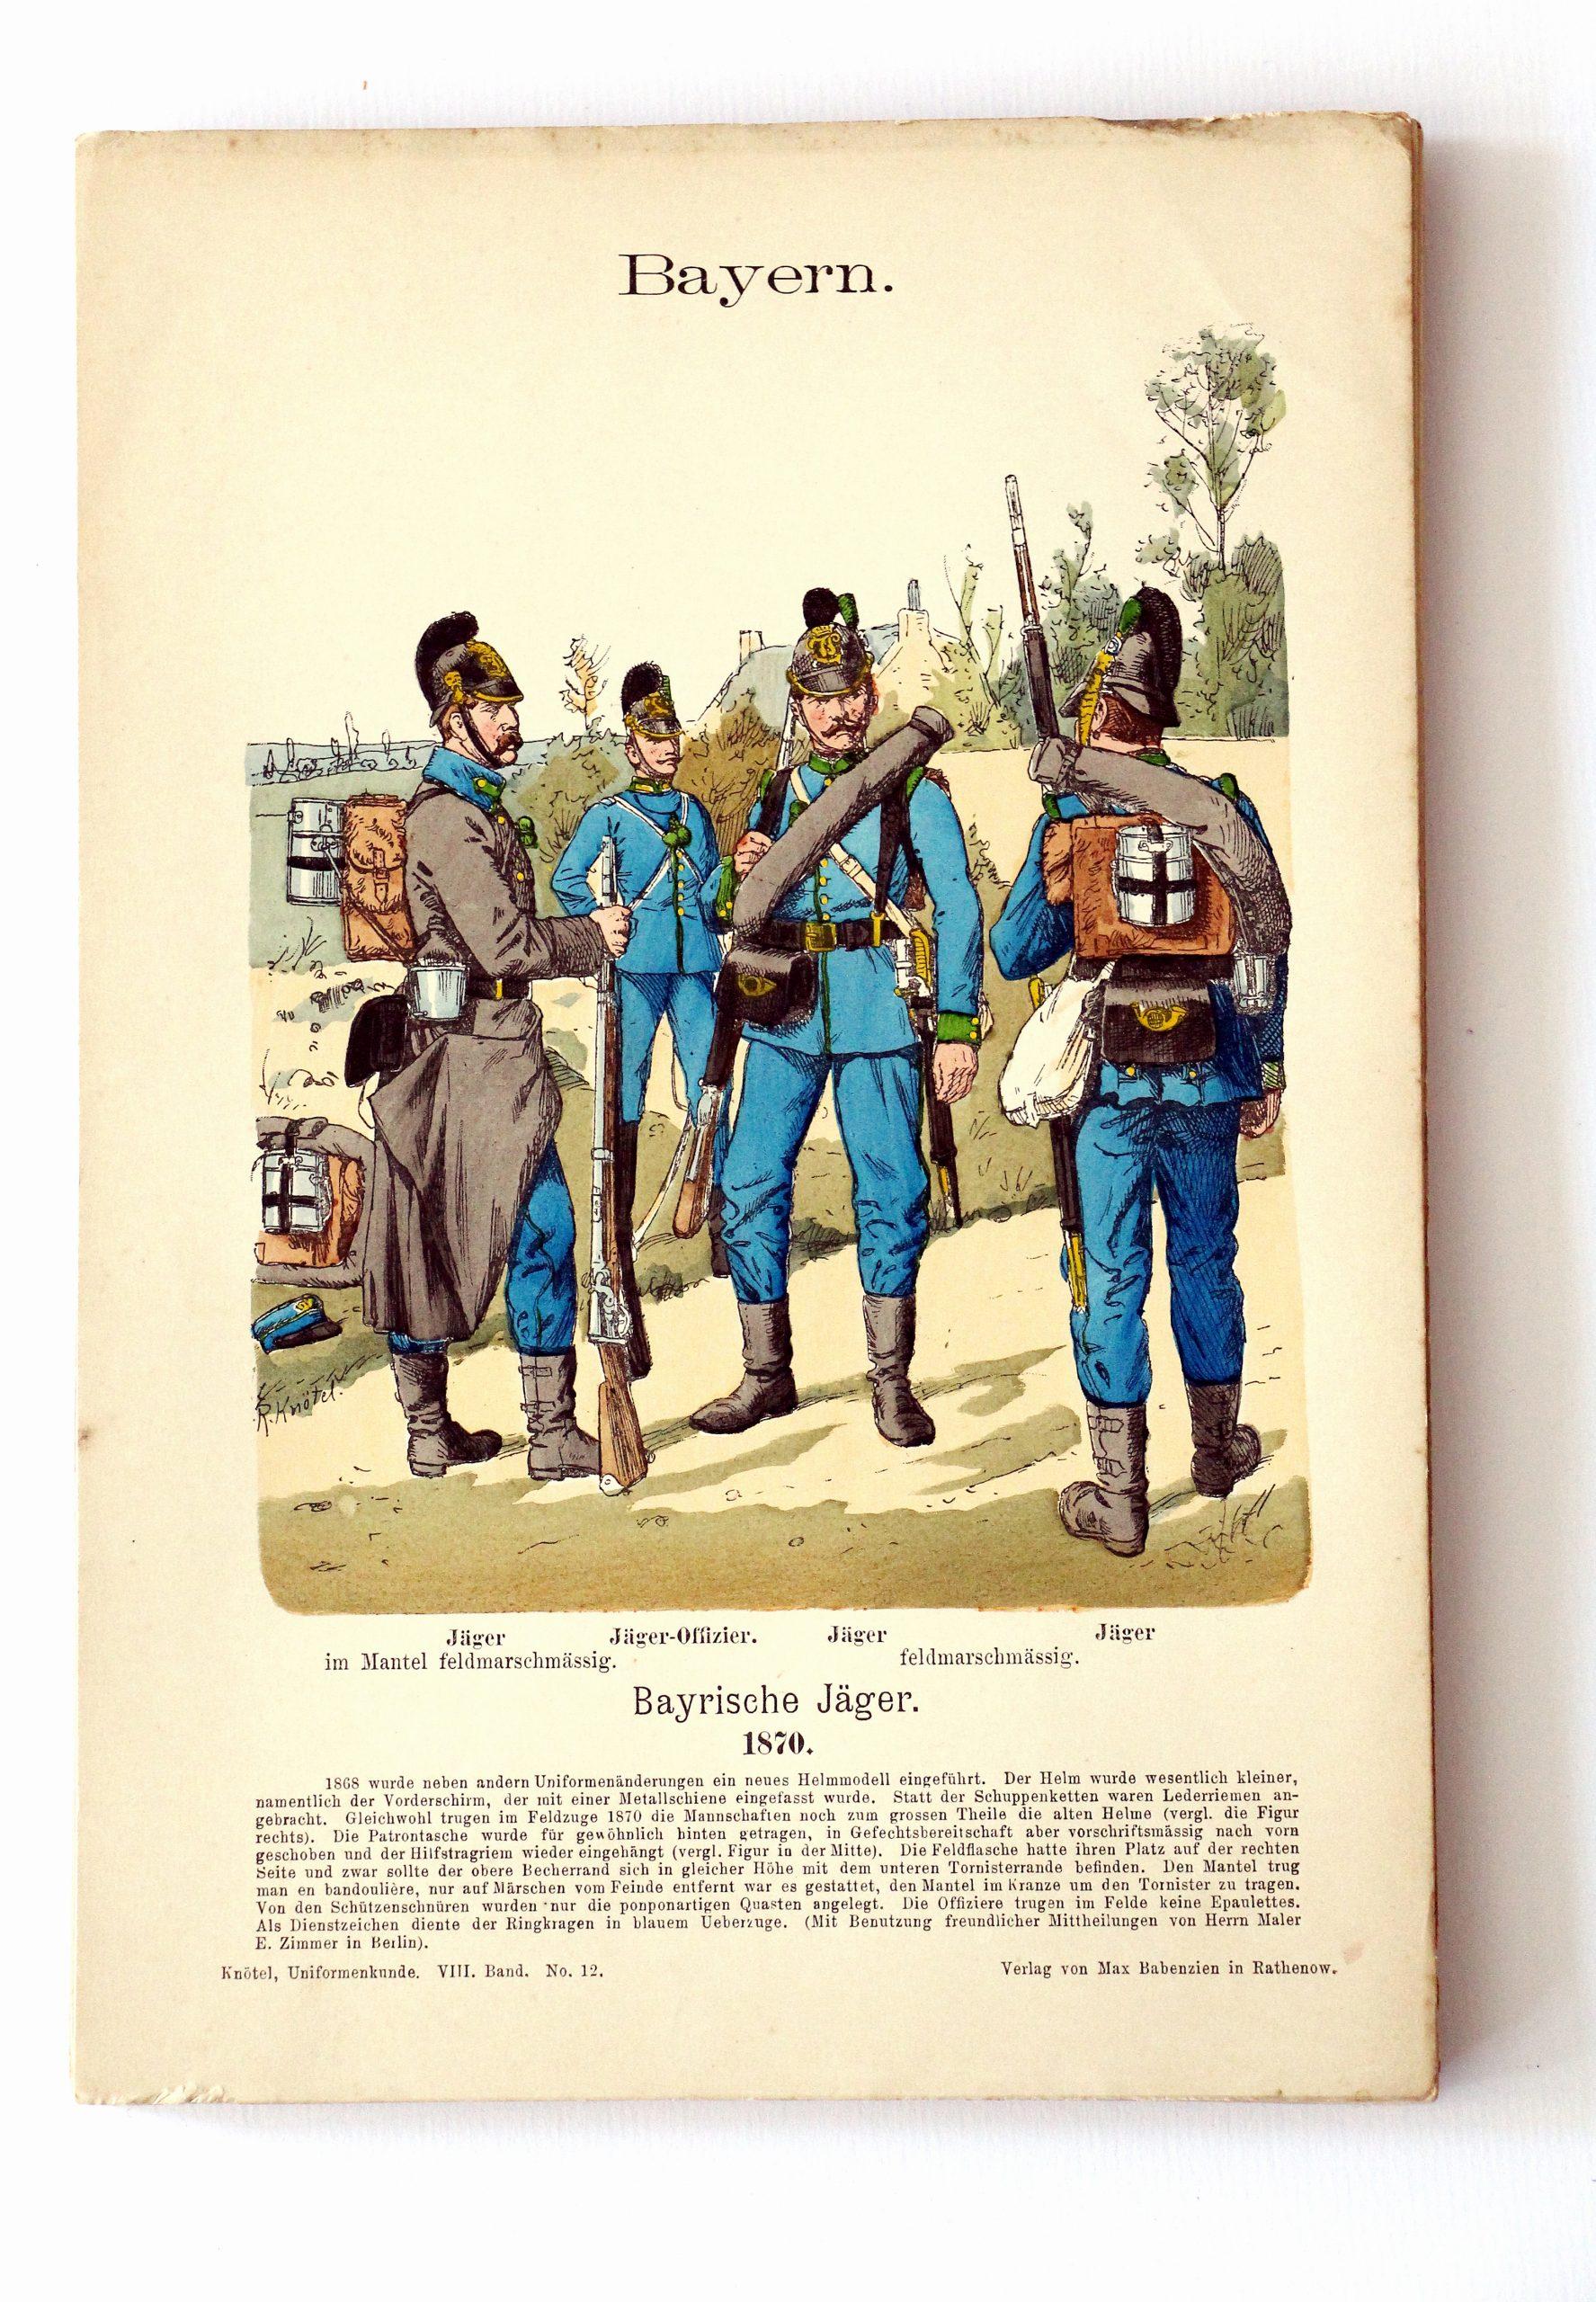 Bayern - Uniformenkunde - Richard Knoetel - VIII - Planche 12